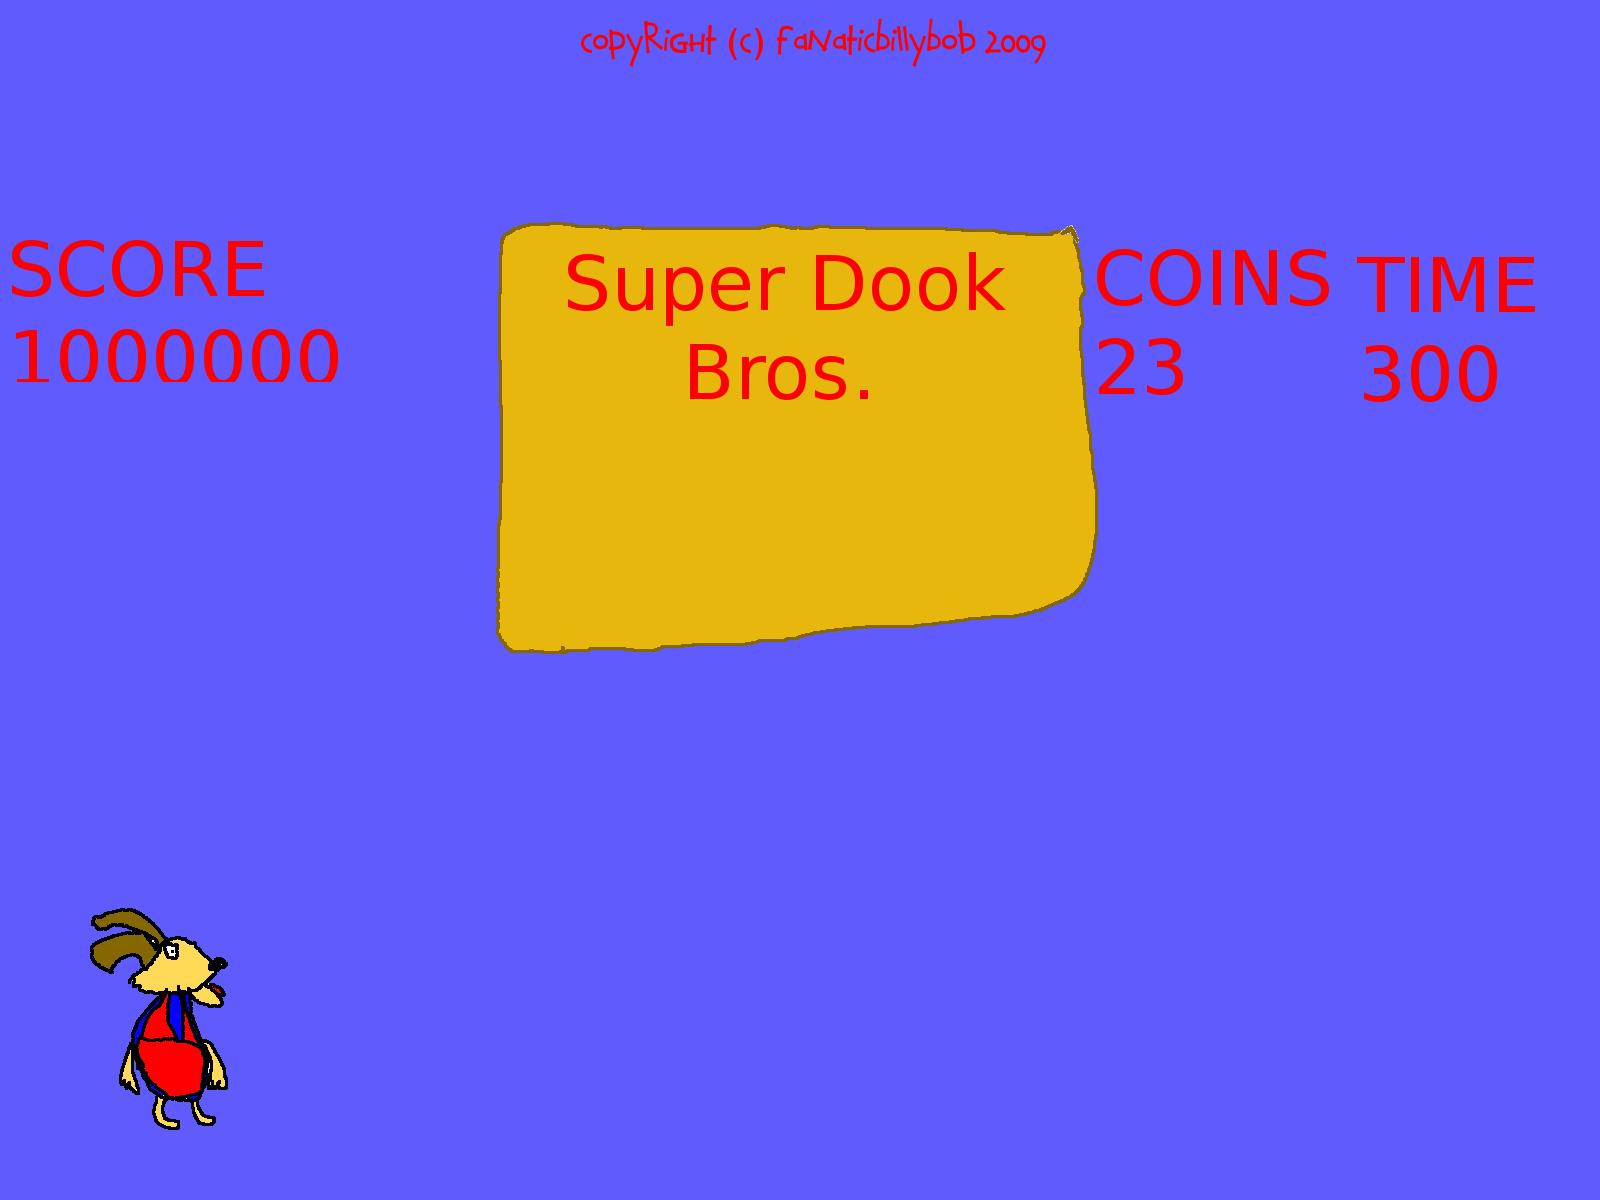 Super Dook Bros.